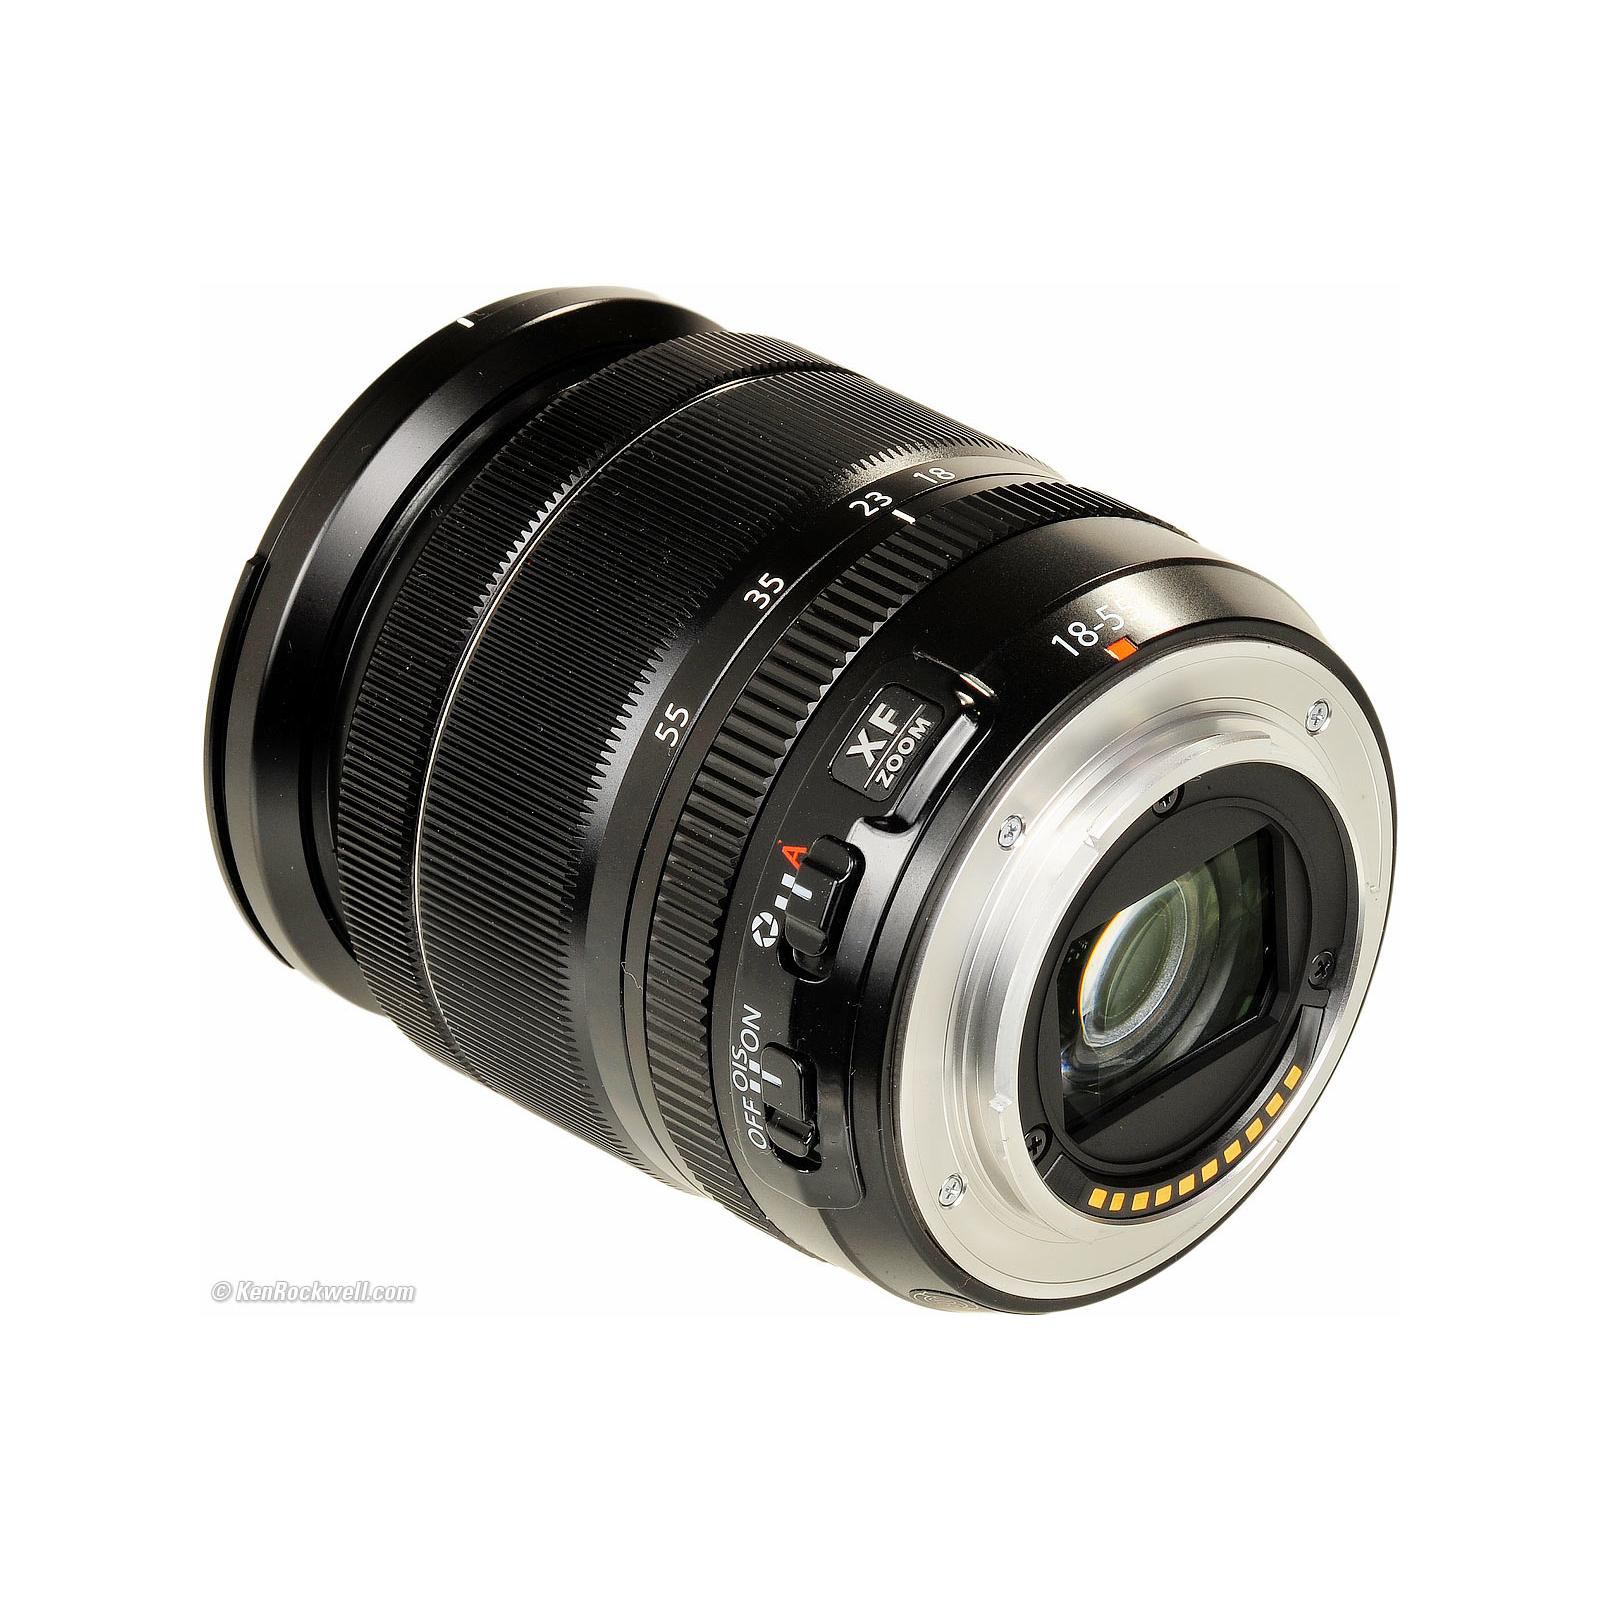 Объектив Fujifilm XF-18-55mm F2.8-4 OIS (16276479) изображение 3